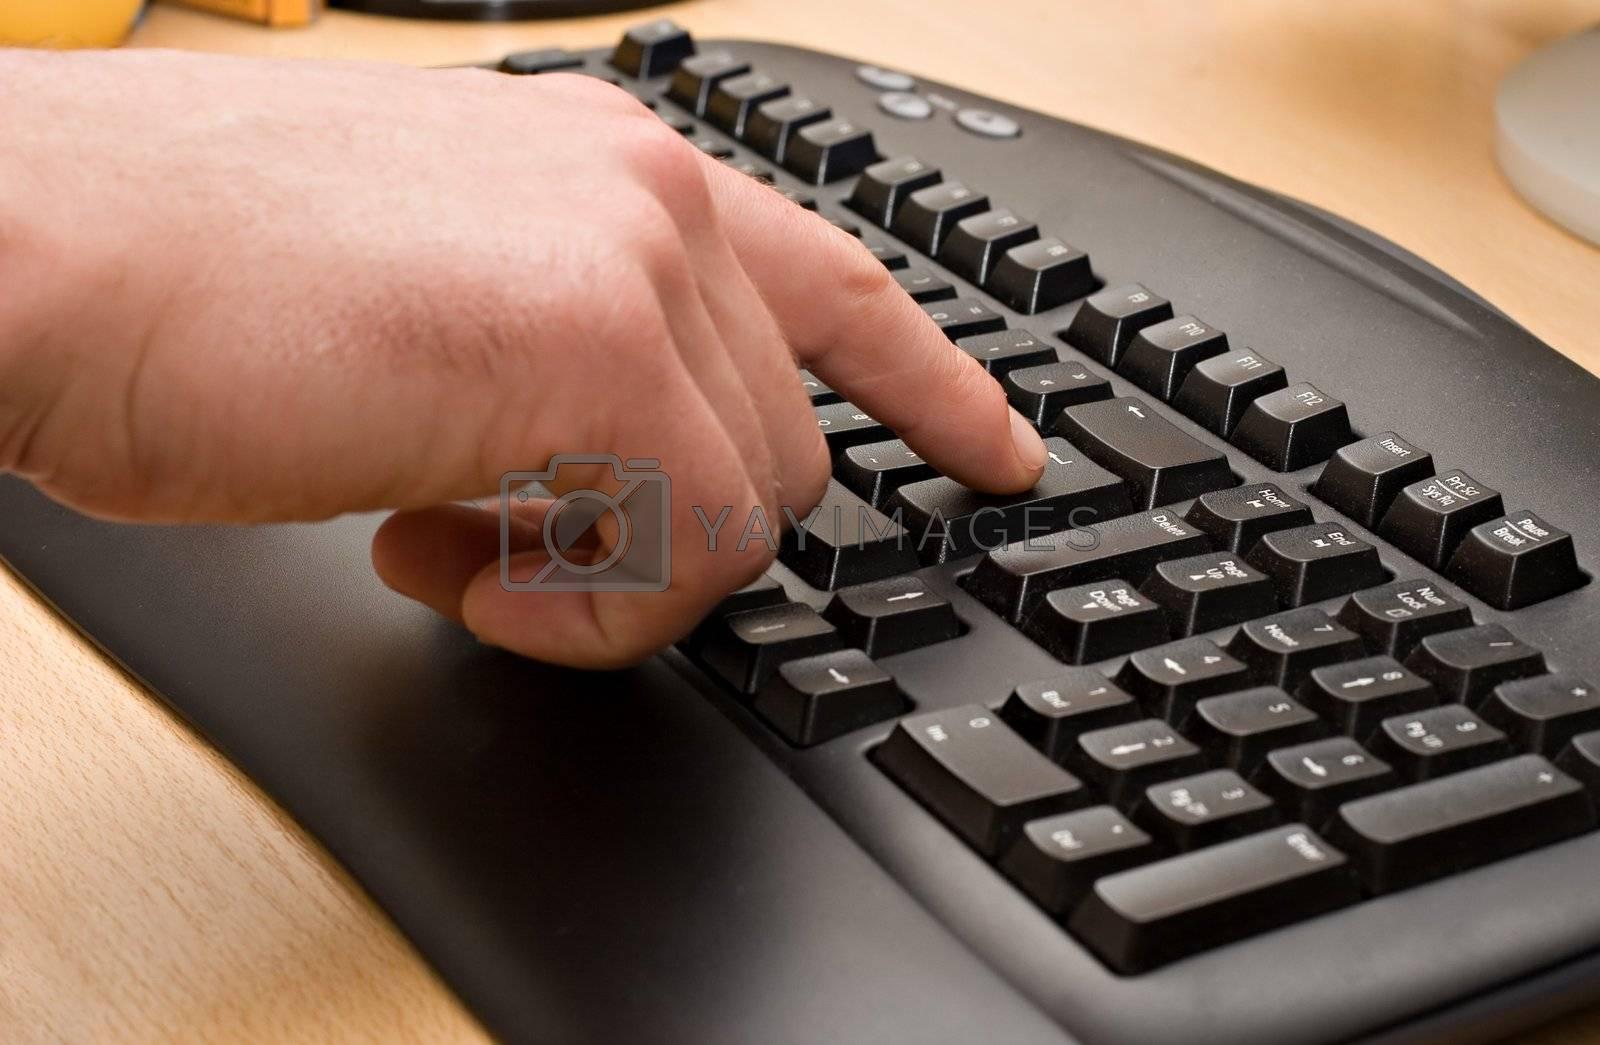 Typing. Pressing Enter Key. Black keyboard on wooden table.